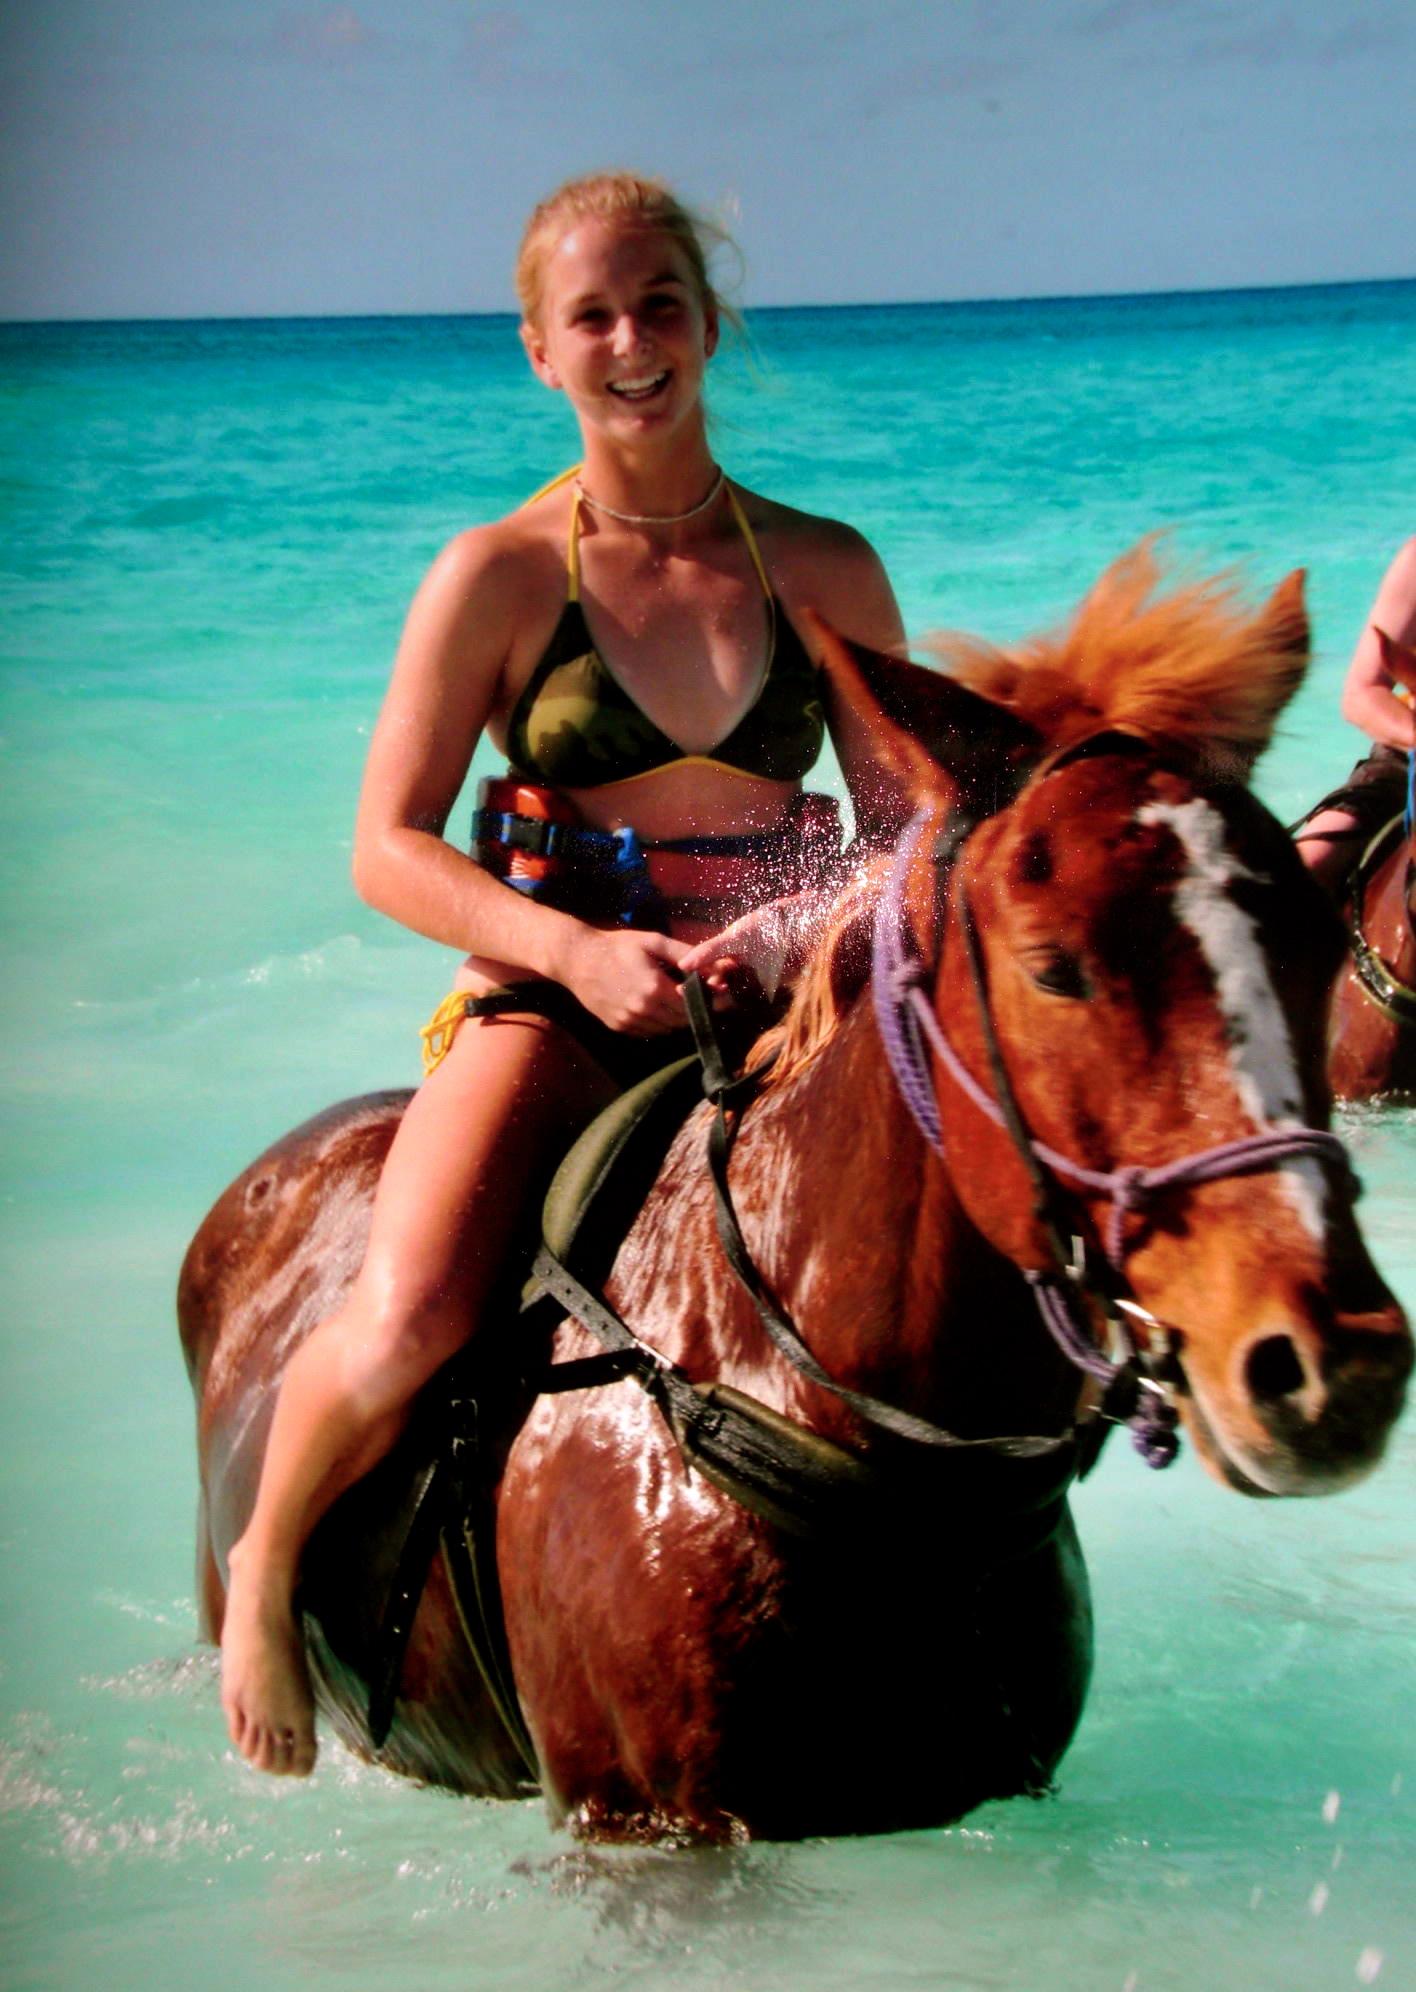 Bettingexpert hot horses sports betting app real money